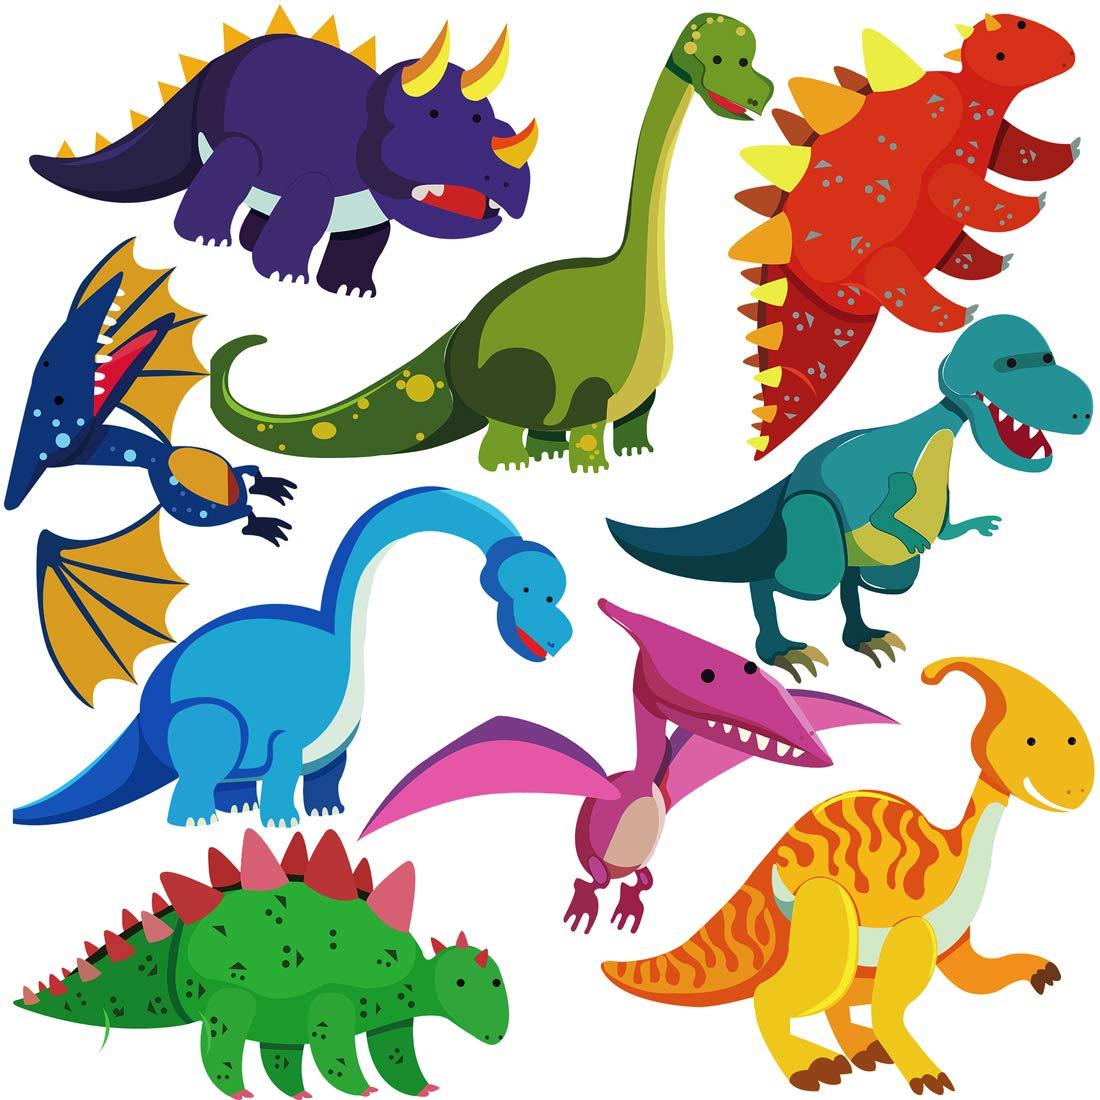 Vinilo Decorativo Pared [7SSBWQ7P] dinosaurios jurasicos